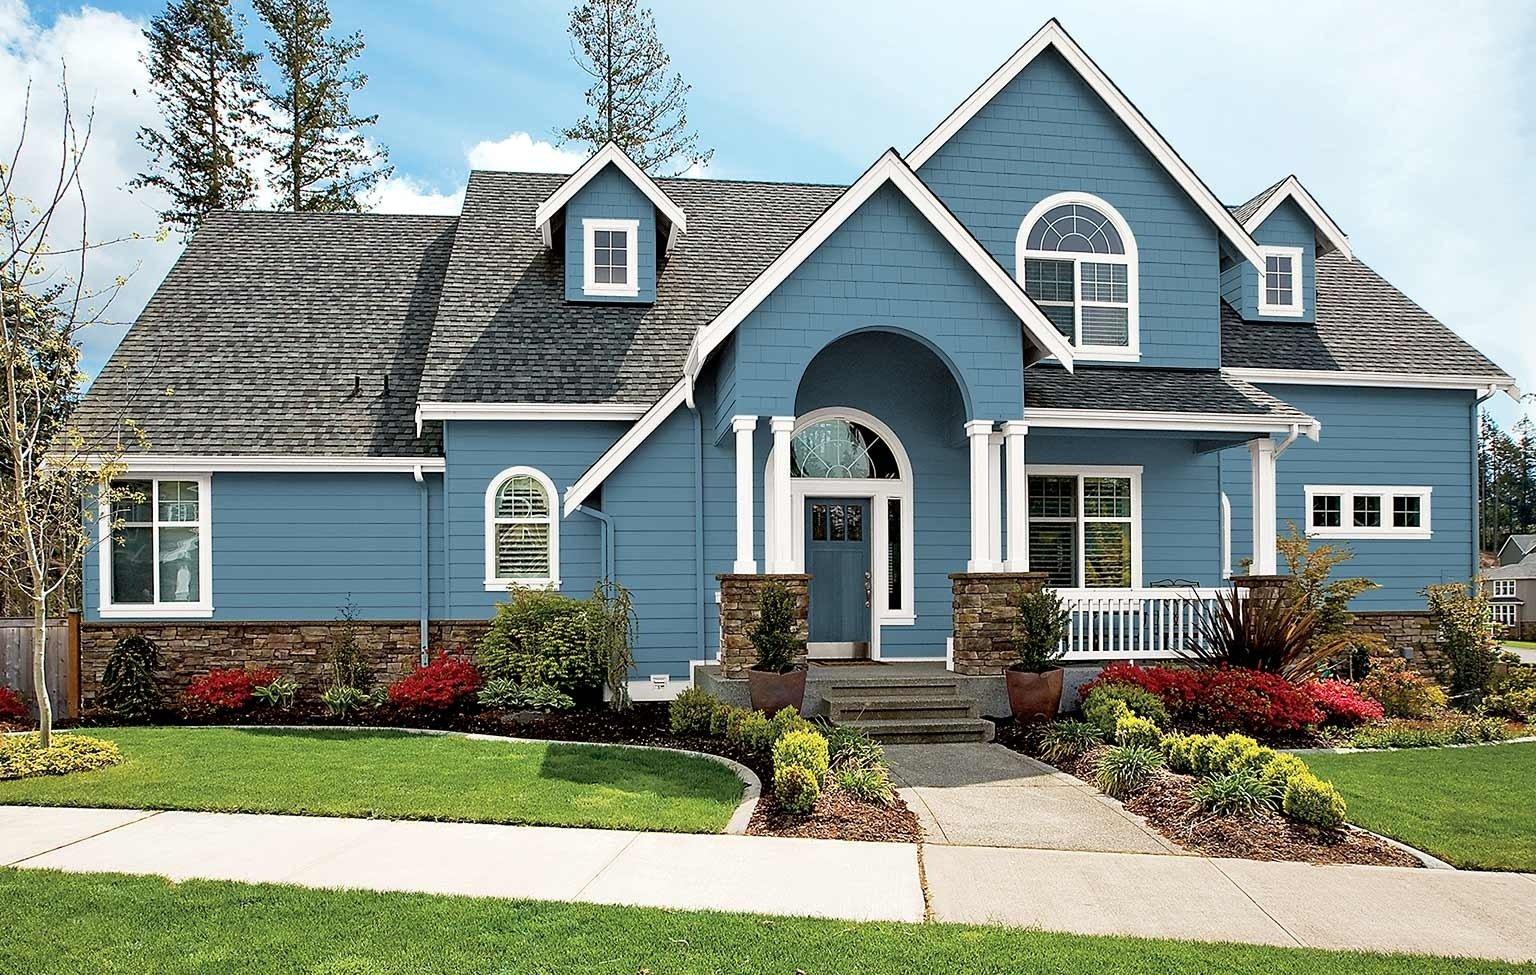 10 Fantastic Exterior Paint Ideas For Homes house paint colors for your exterior 1 2021